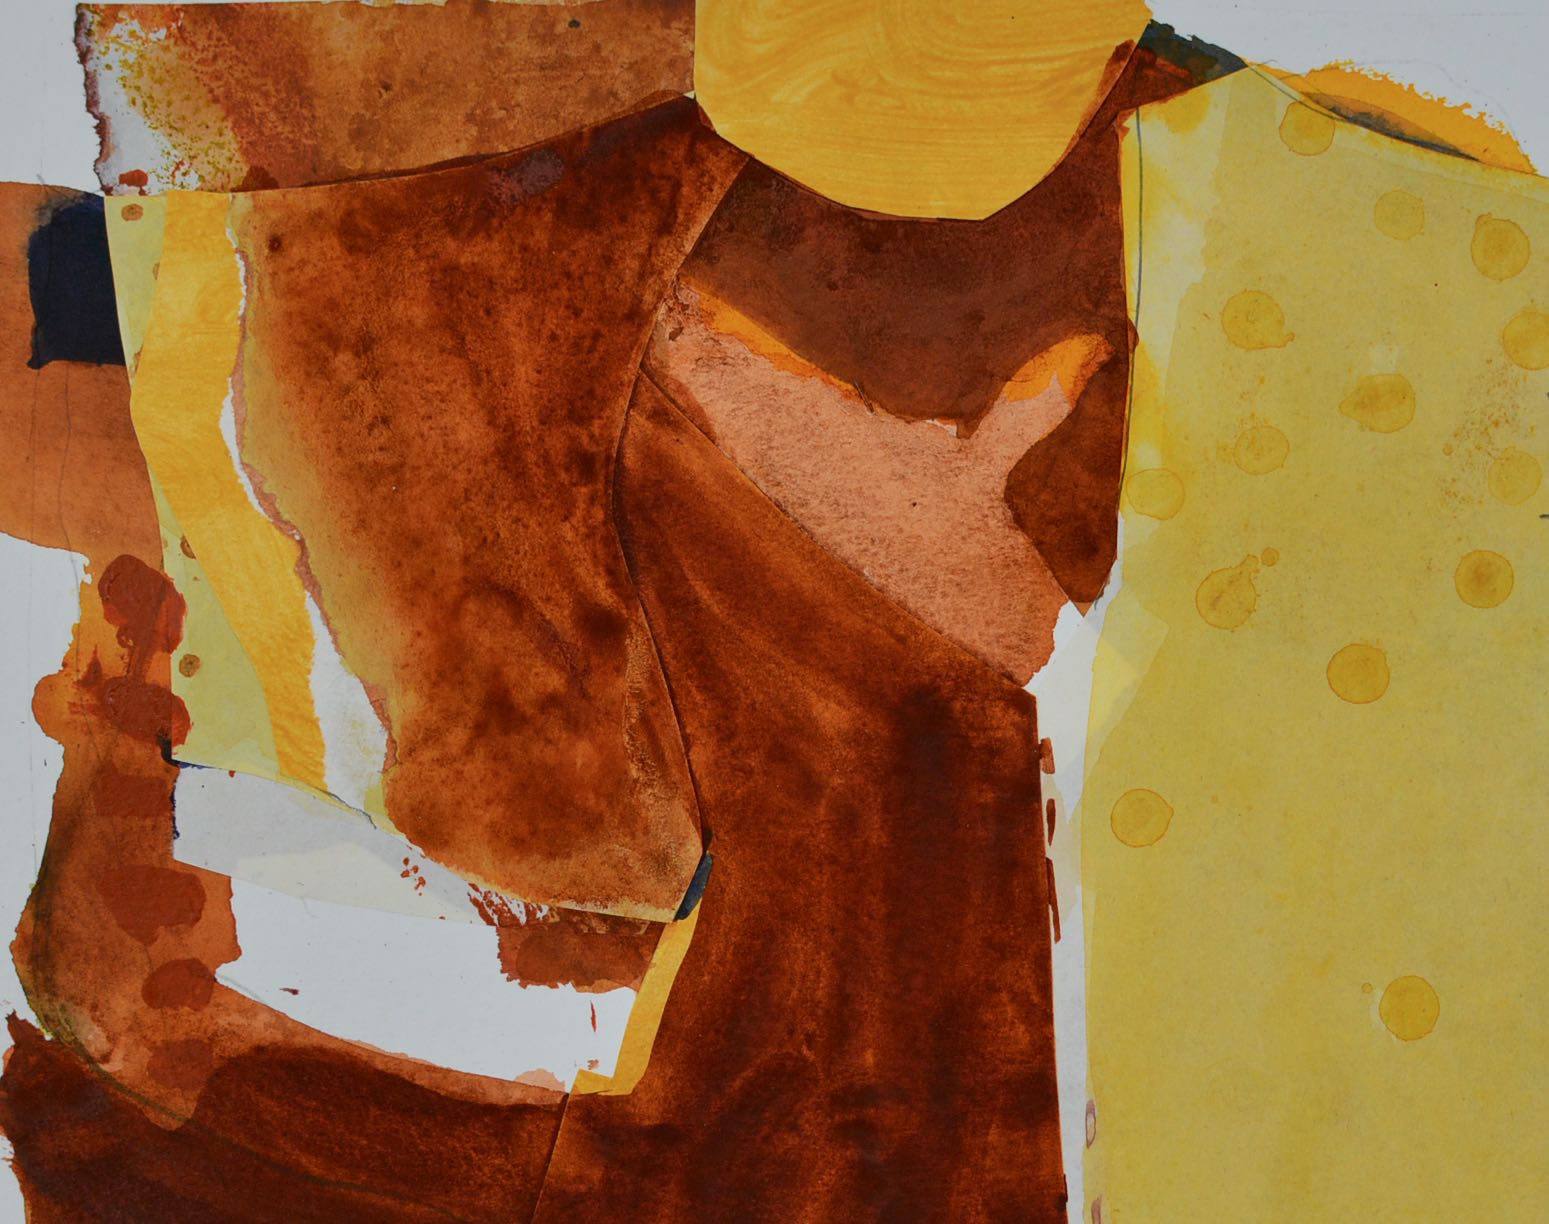 "<span class=""link fancybox-details-link""><a href=""/artists/149-jim-hunter/works/12707-jim-hunter-quarried-landscape-1/"">View Detail Page</a></span><div class=""artist""><span class=""artist""><strong>Jim Hunter</strong></span></div><div class=""title""><em>Quarried Landscape 1</em></div><div class=""medium"">watercolour collage</div><div class=""dimensions"">Artwork: 18 x 22cm</div><div class=""price"">£350.00</div>"